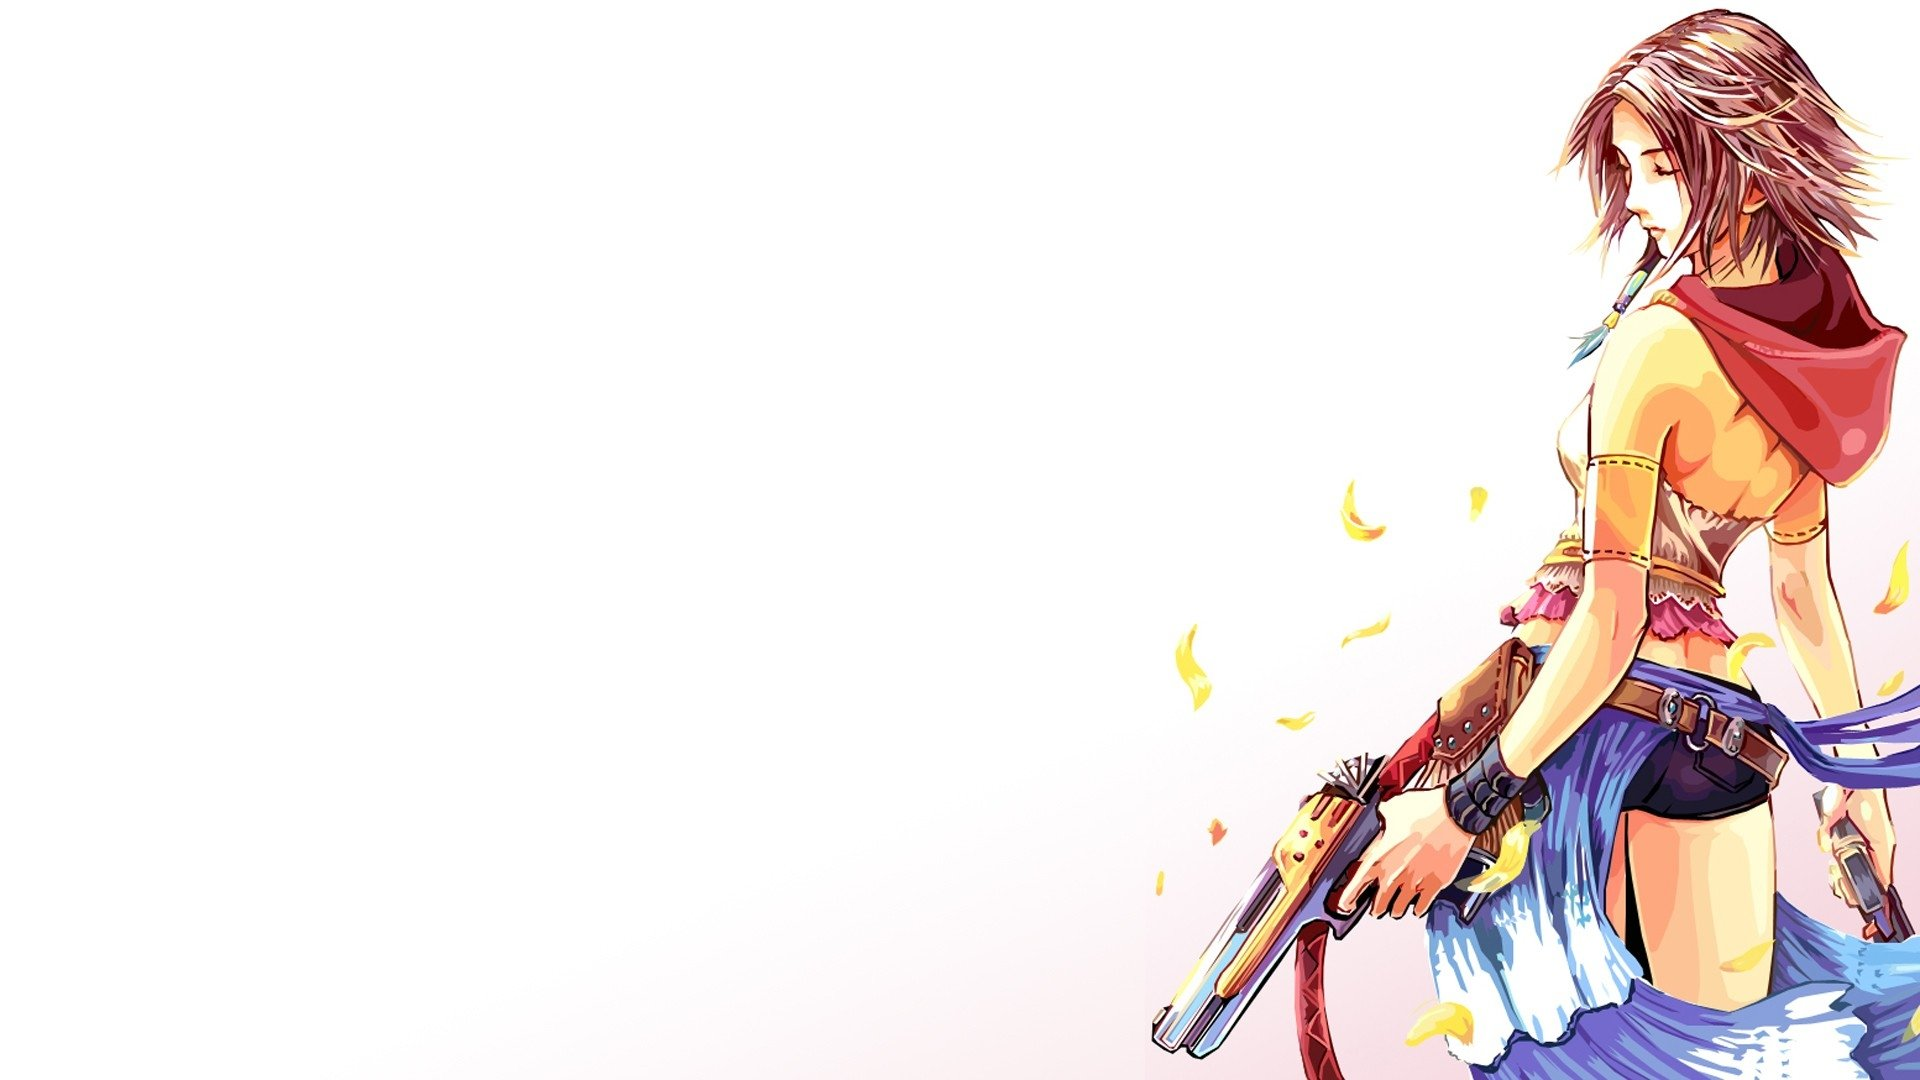 Final Fantasy X 2 Hd Wallpaper Background Image 1920x1080 Id